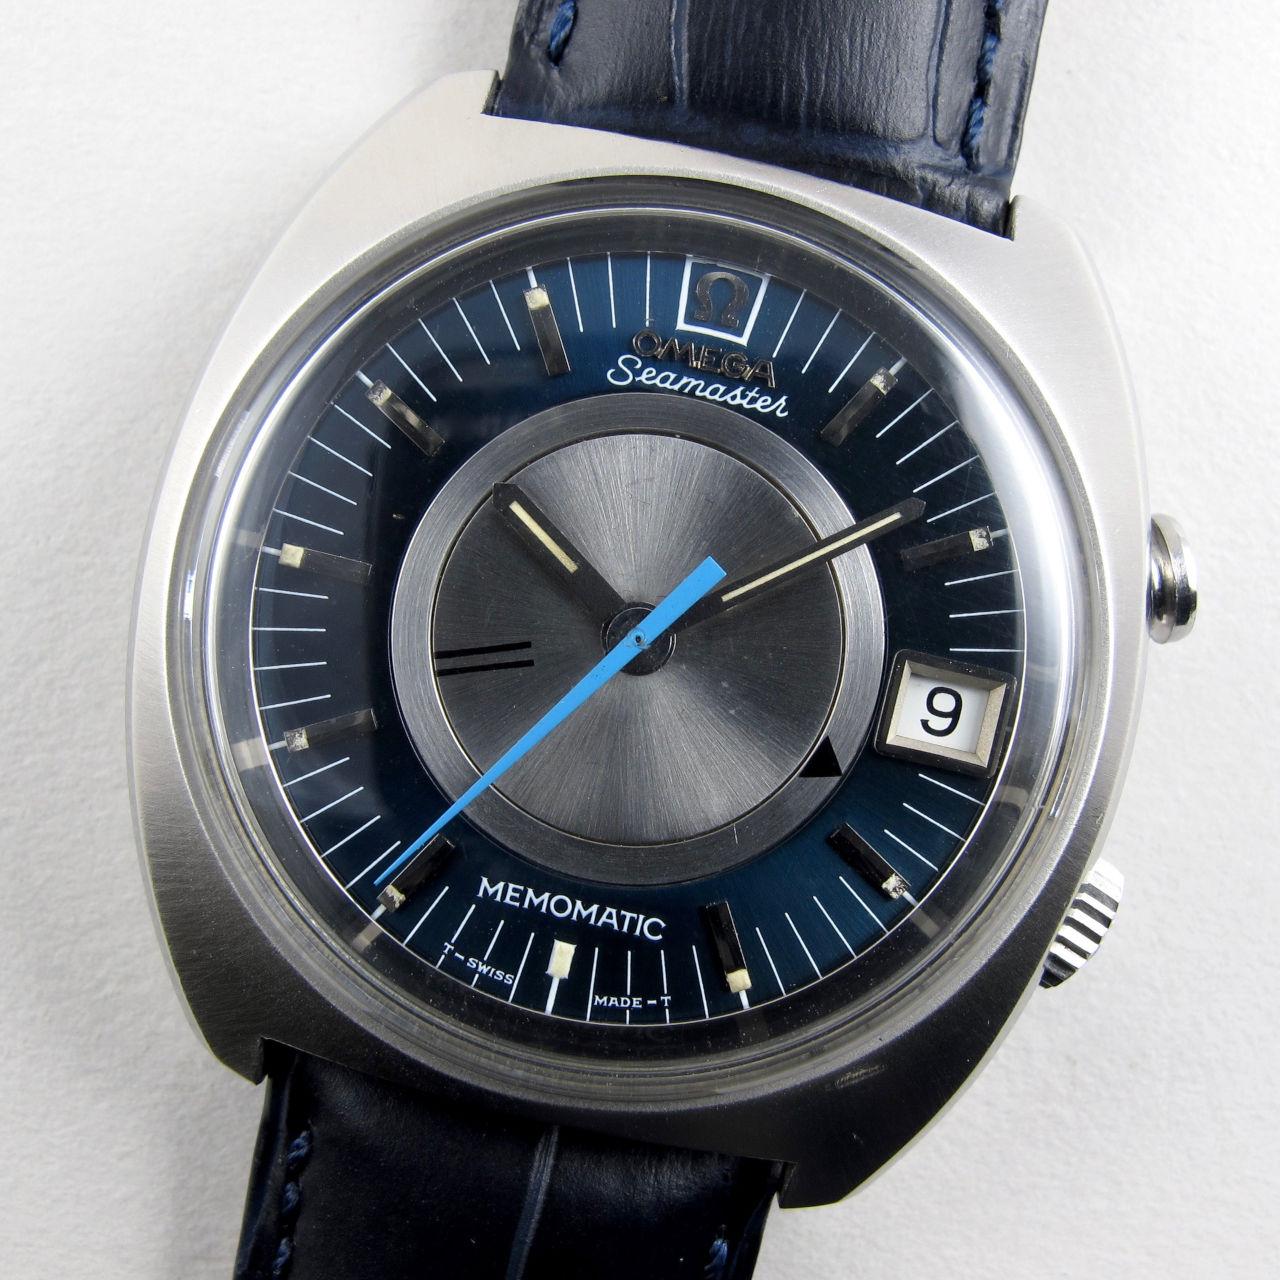 omega-seamaster-memomatic-ref-166-072-vintage-wristwatch-circa-1971-wxom-v01